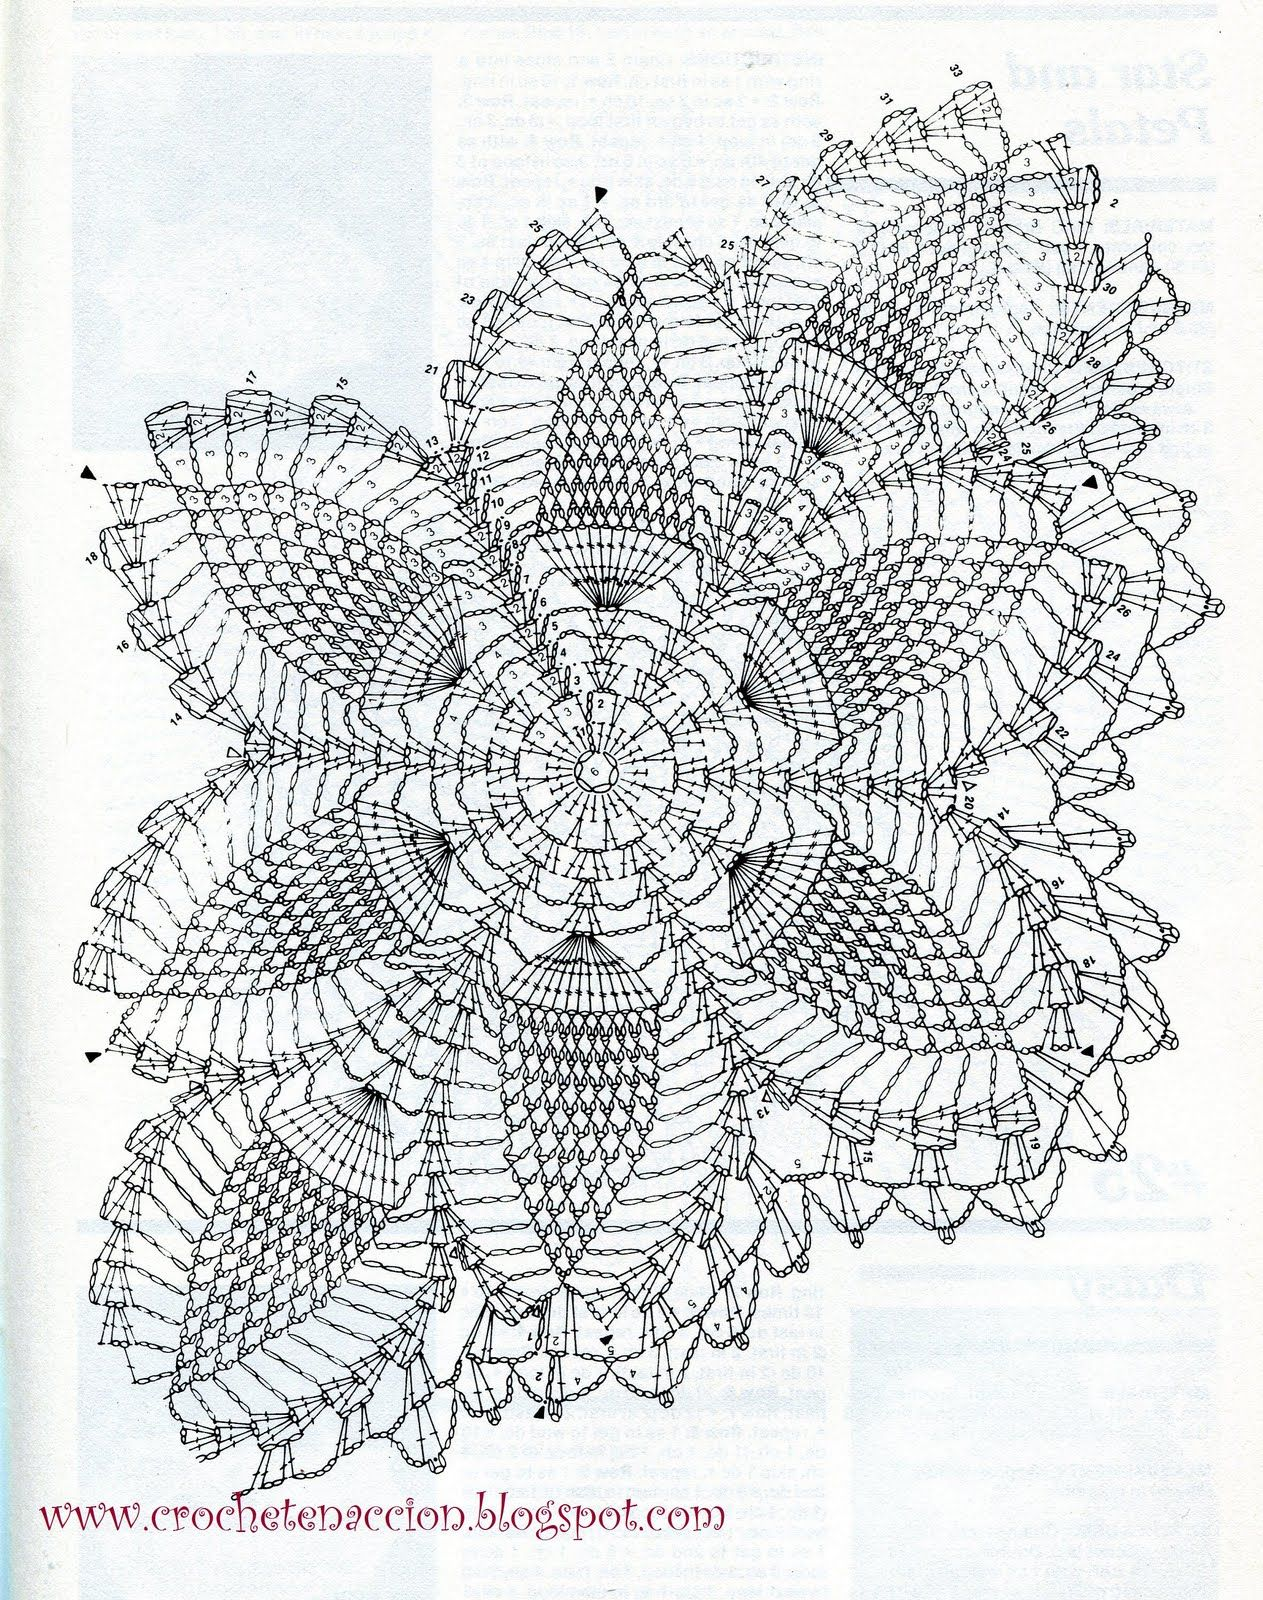 Pineapple Crochet Doily Diagram 1998 Honda Accord Stereo Wiring Esquema Pinterest Doilies